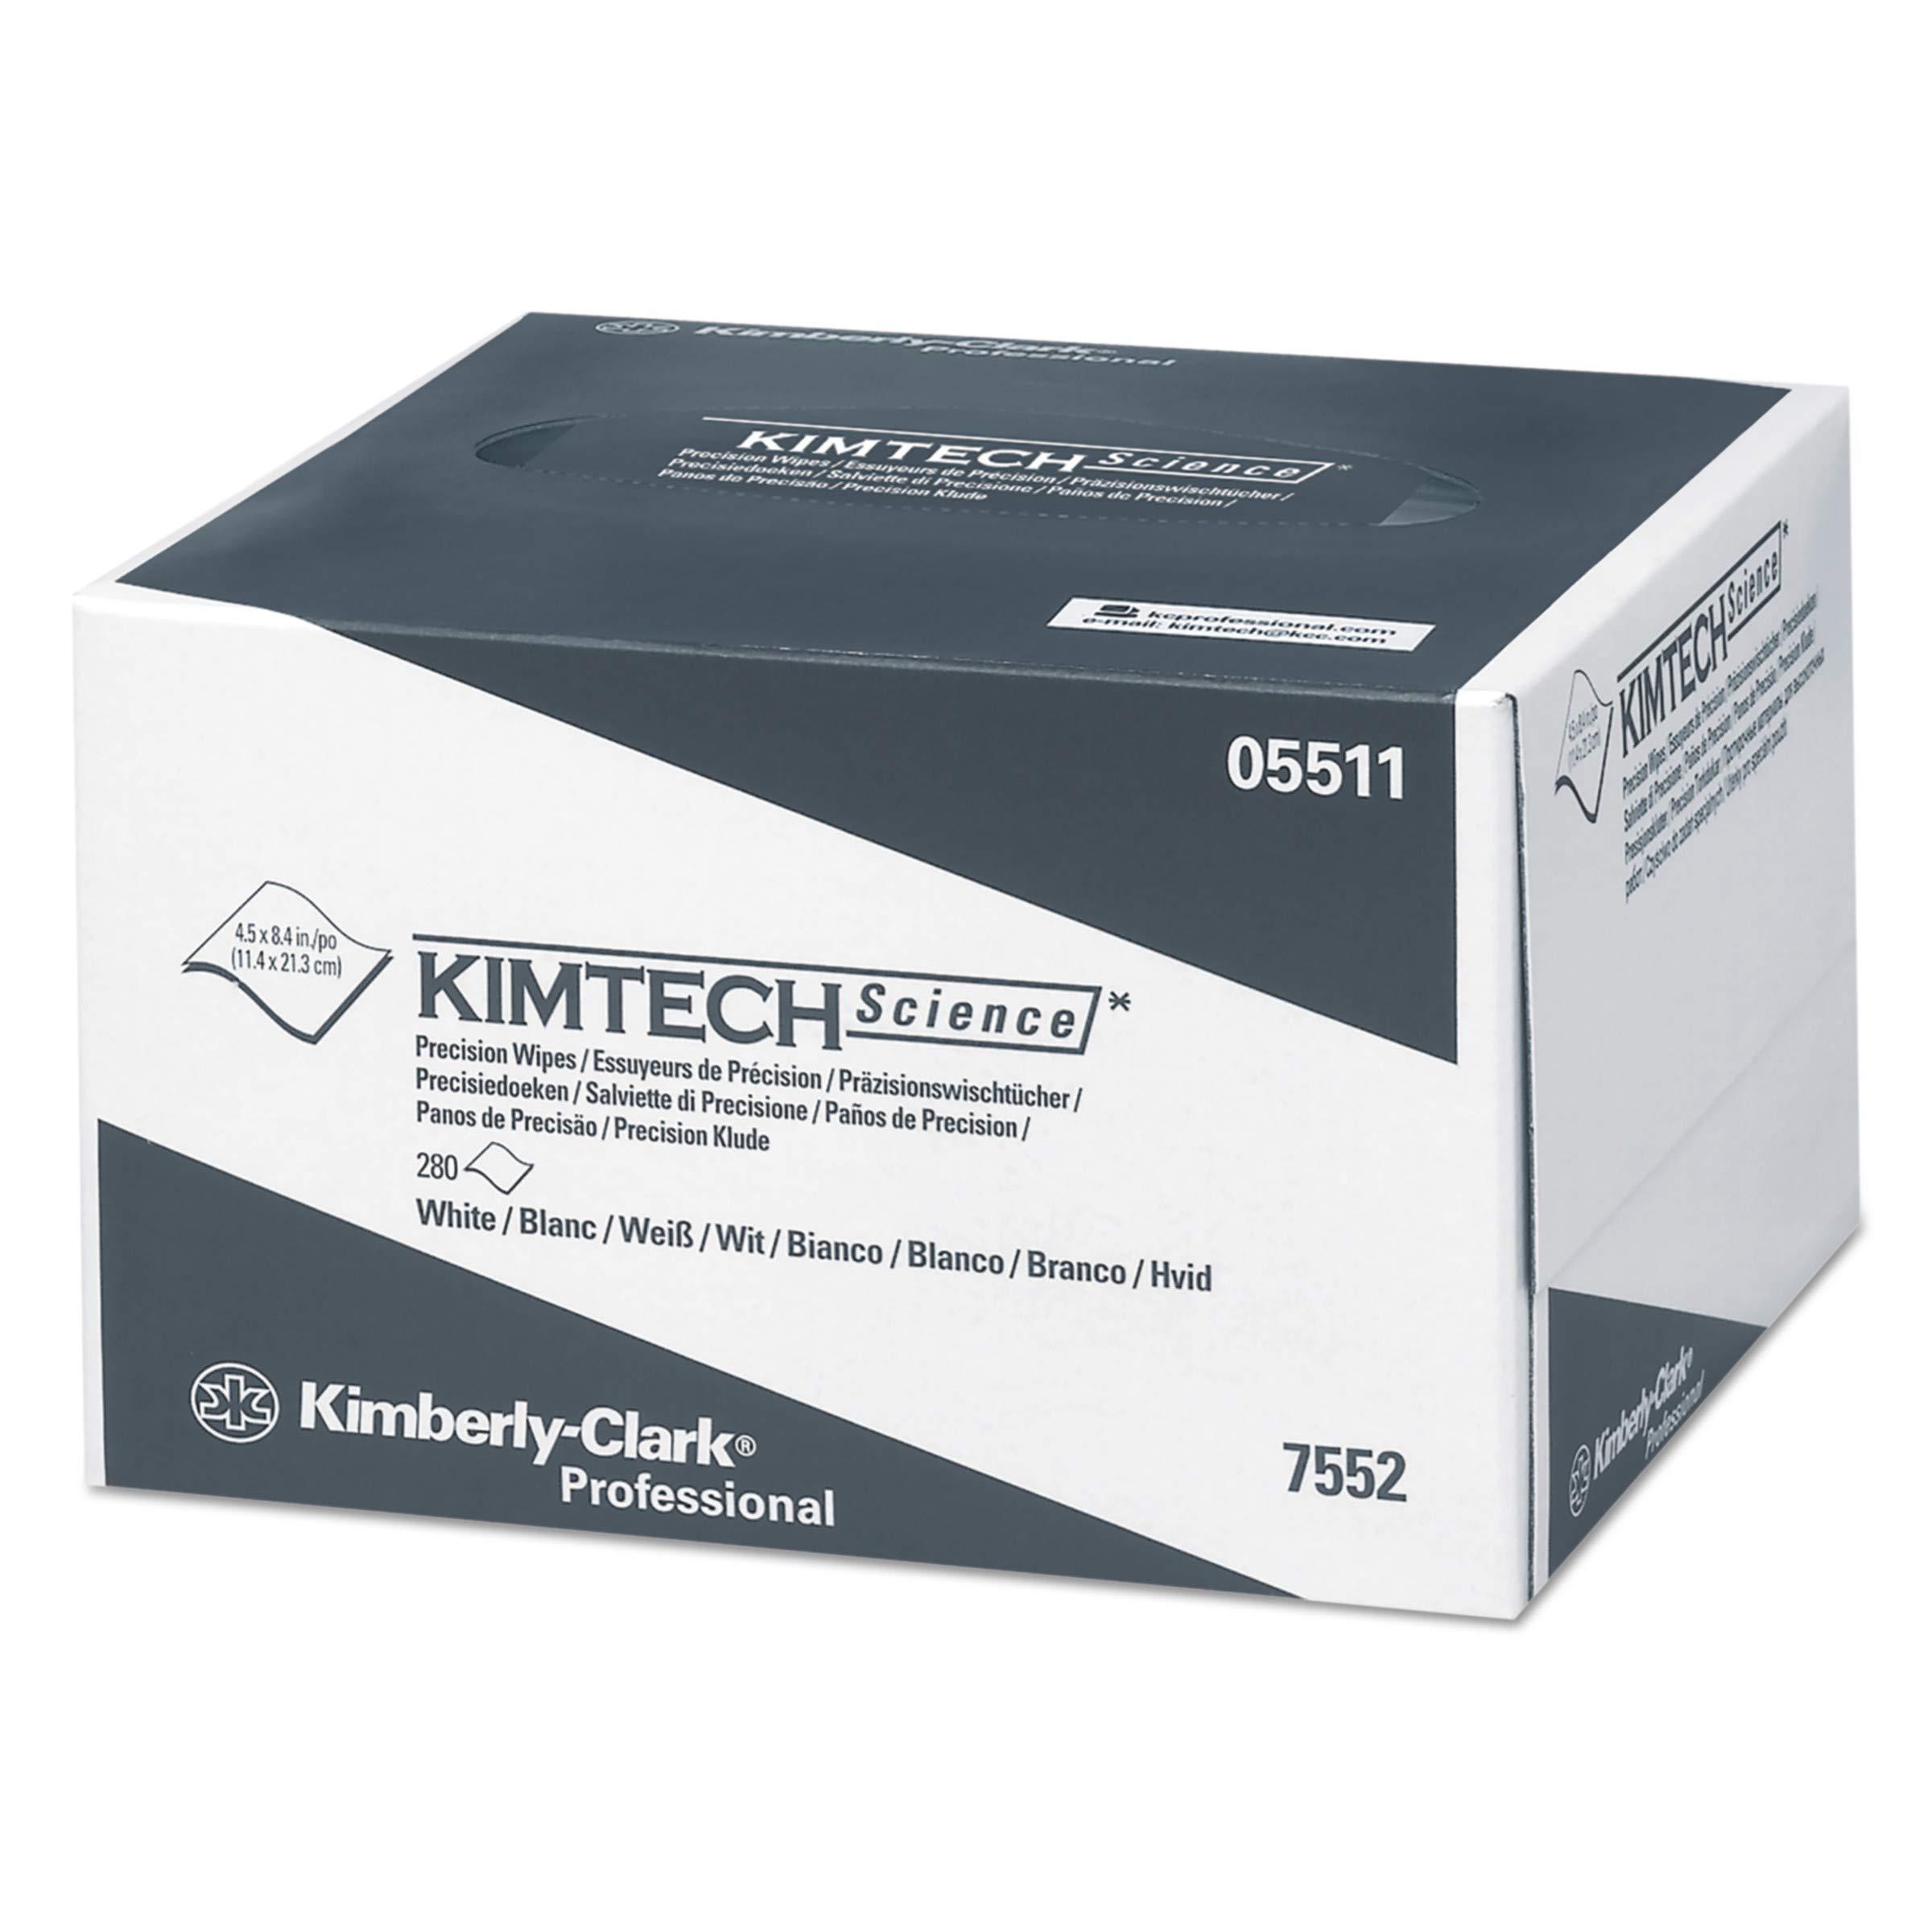 Kimtech 05511 Precision Wipers, POP-UP Box, 1-Ply, 4 2/5 x 8 2/5, White, 280 per Box (Case of 60 Boxes)